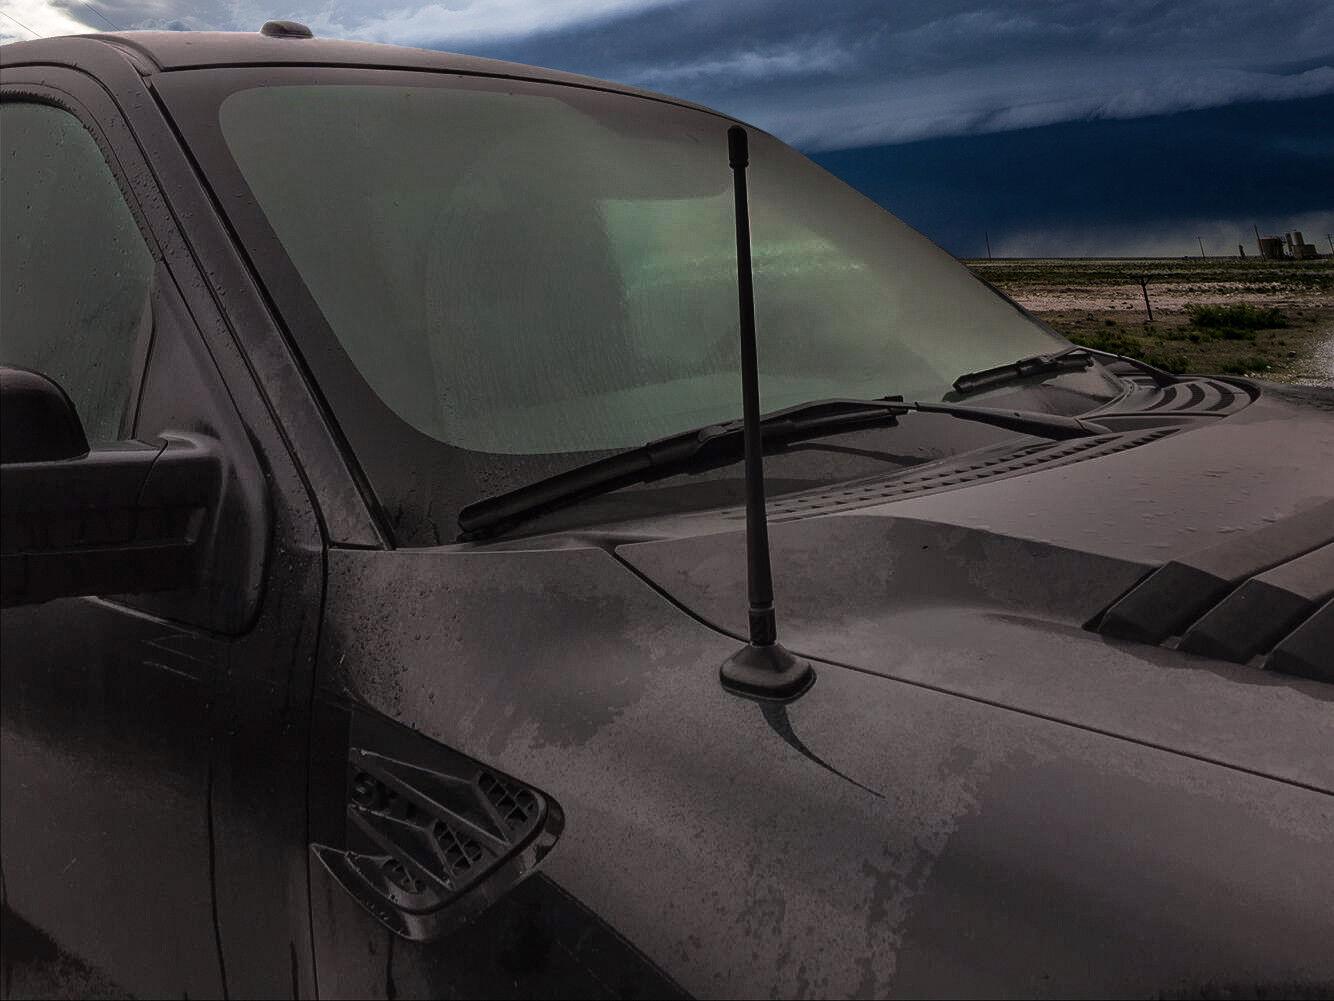 "как выглядит Rydonair 13"" Car Radio Antenna Mast Compatible with Ford F150 Raptor 2009-2021 фото"